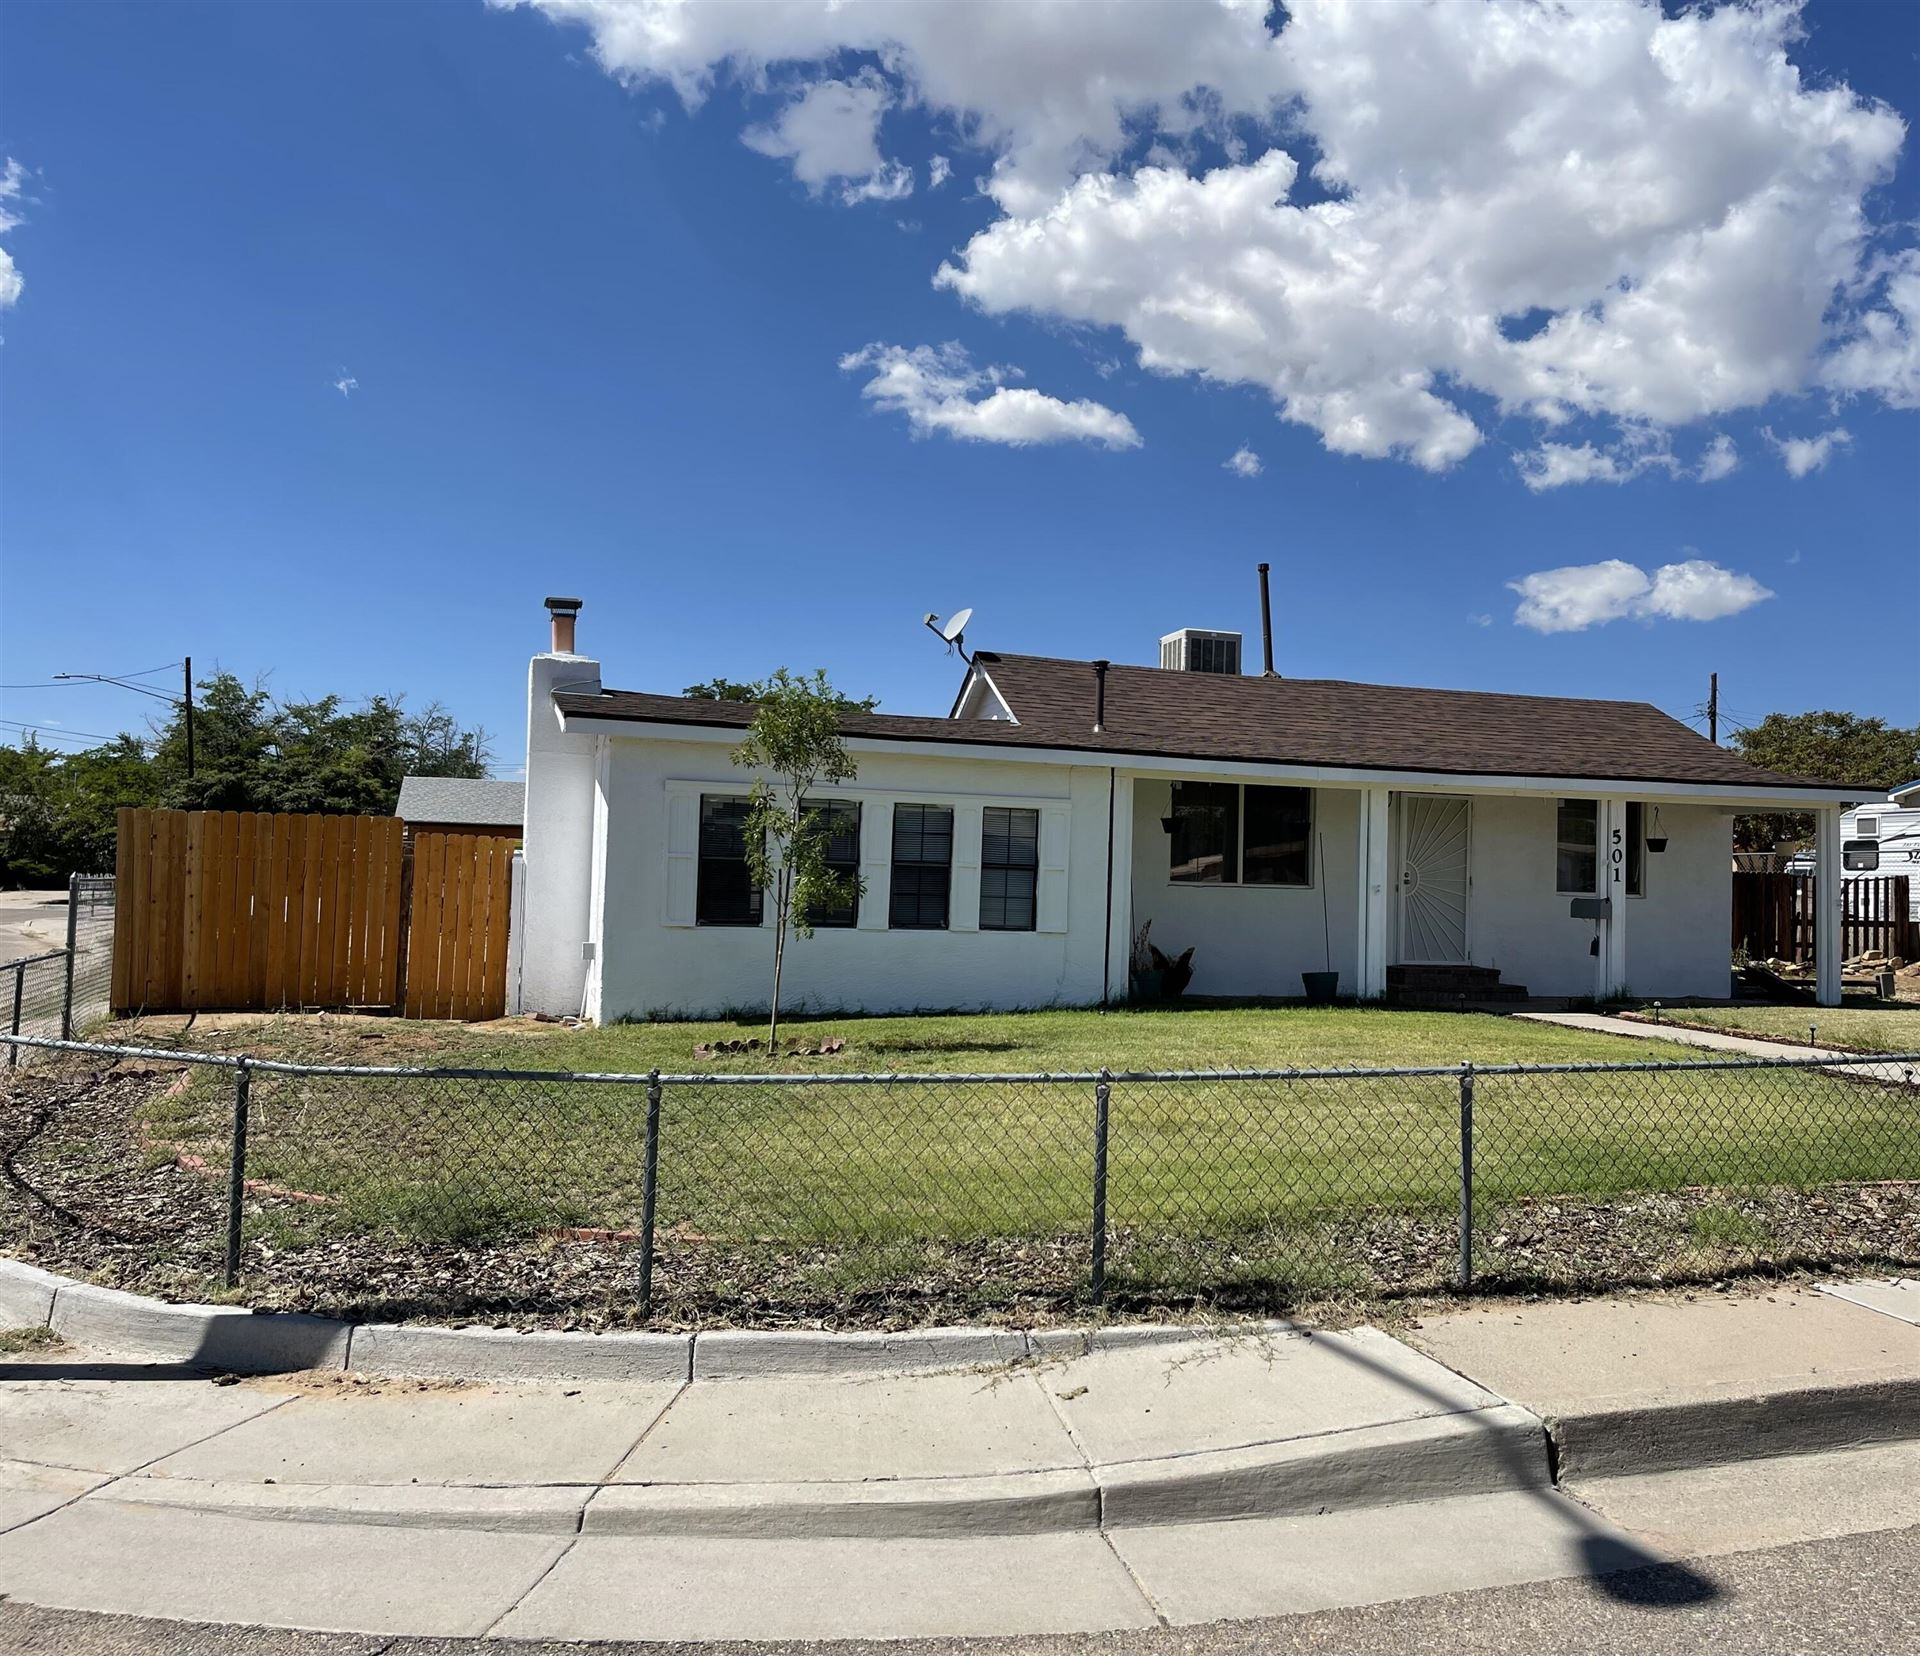 501 LOMA HERMOSA Drive NW, Albuquerque, NM 87105 - #: 999730